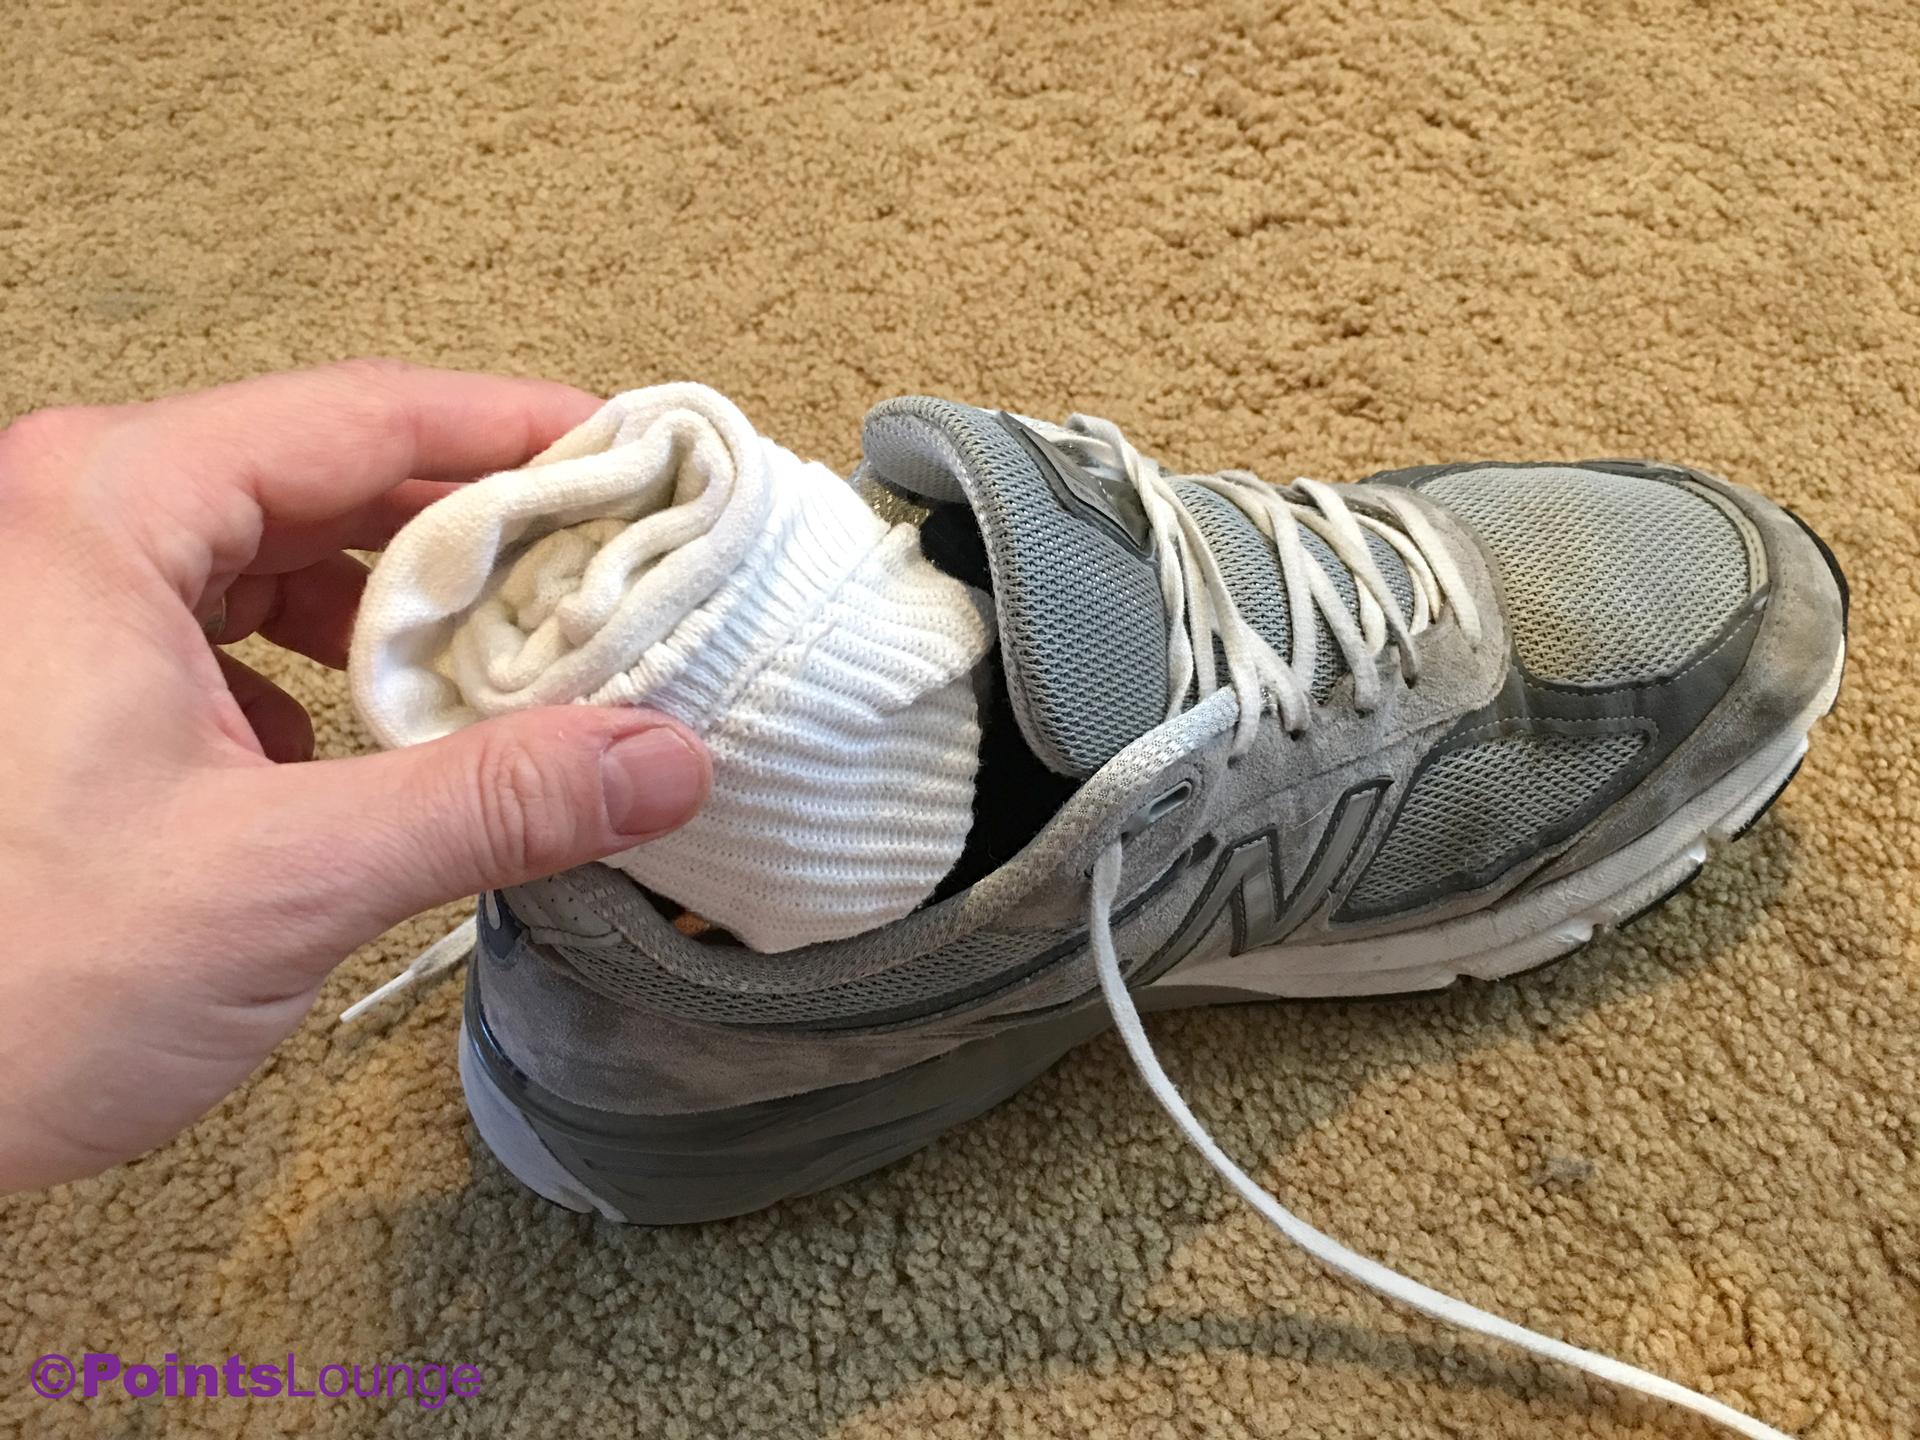 Placing sock balls into a pair of shoes (New Balance M990GL4 Grey/Castlerock)